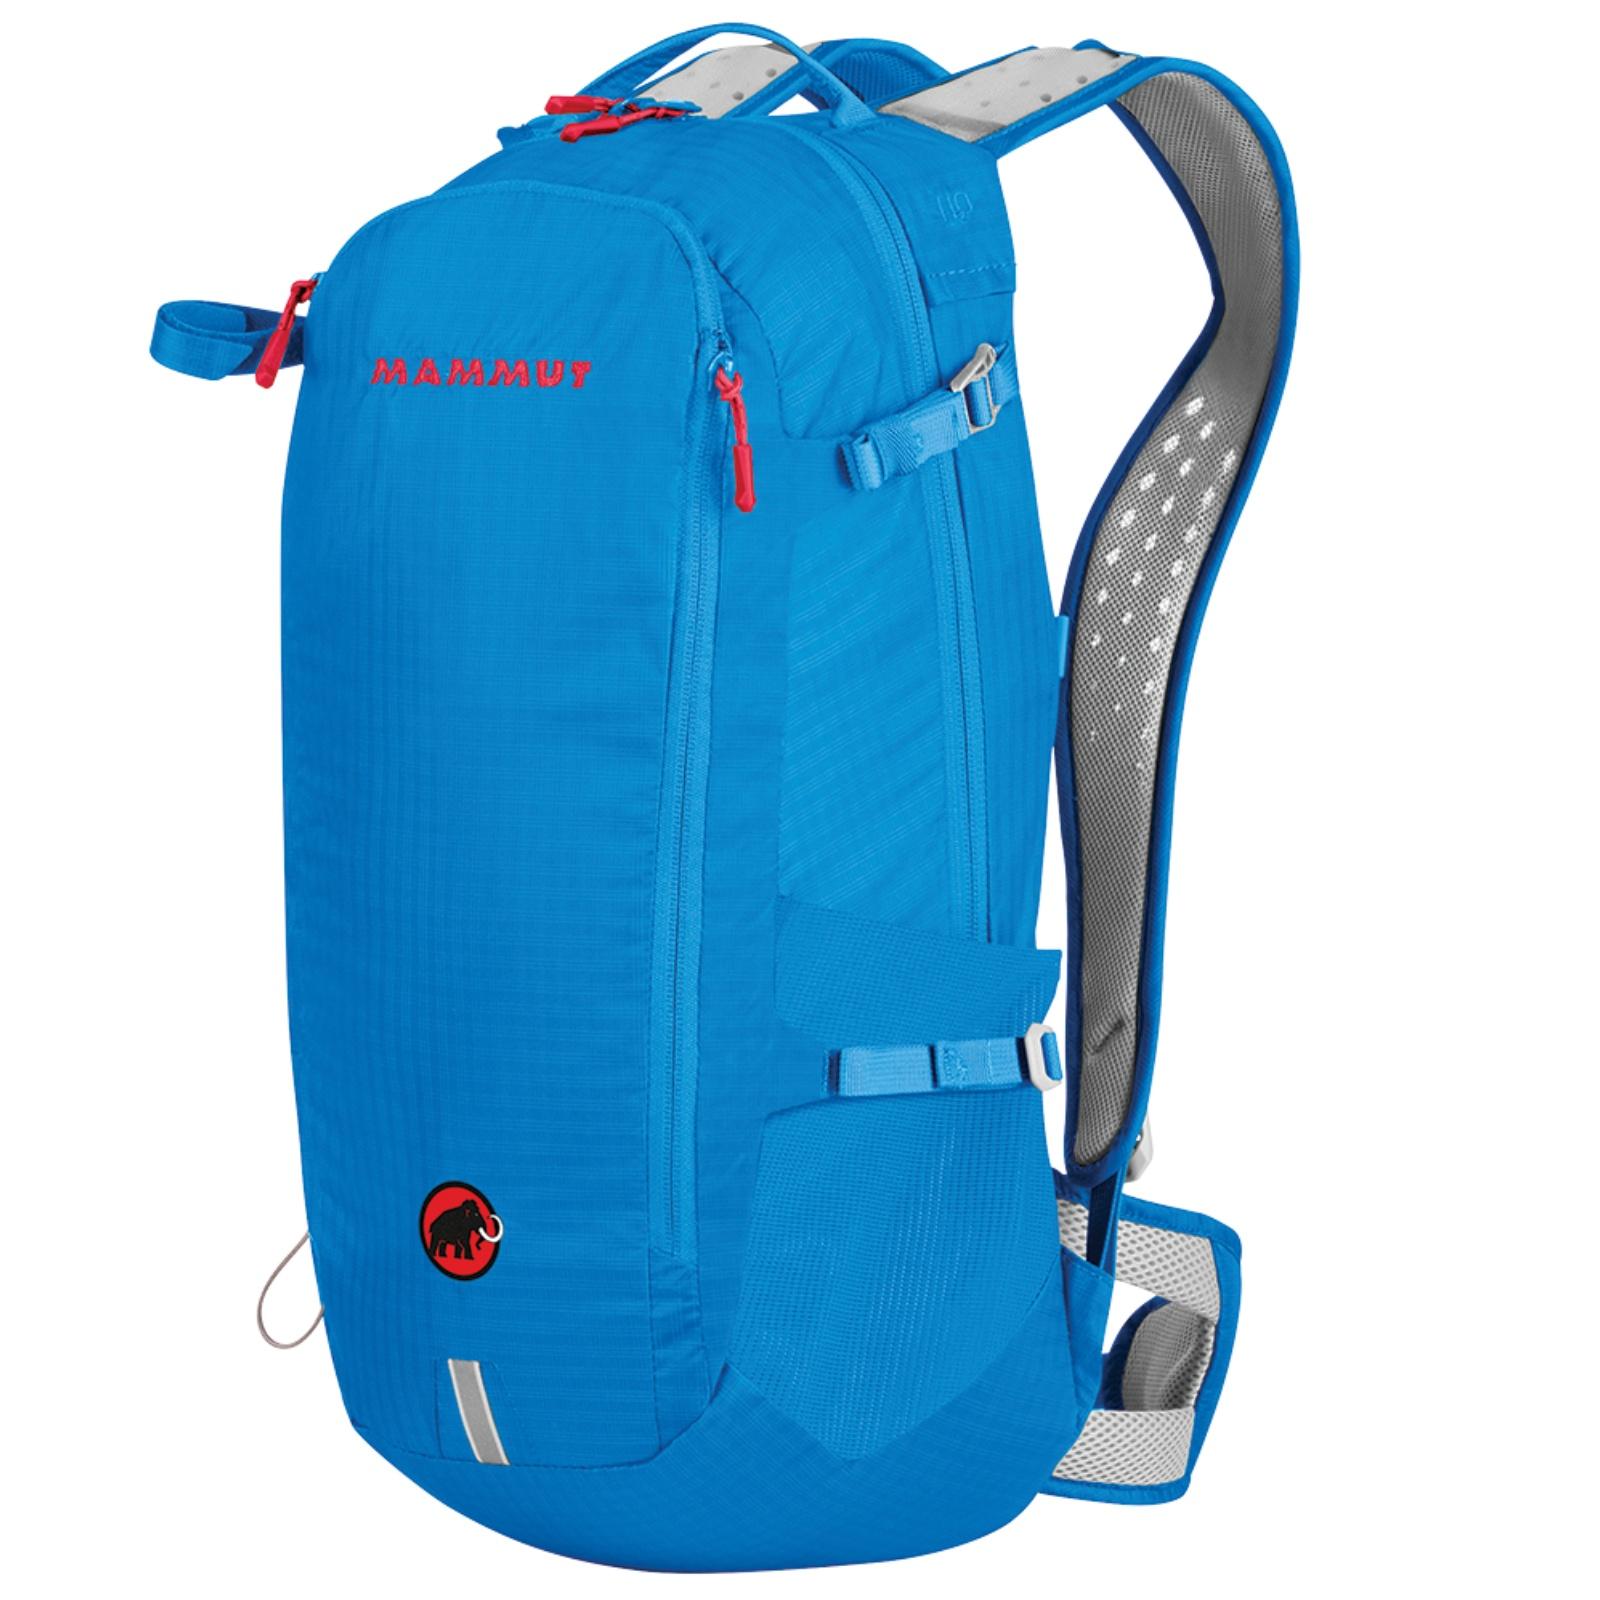 Outdoorový batoh MAMMUT Lithium Speed 20 - modrý